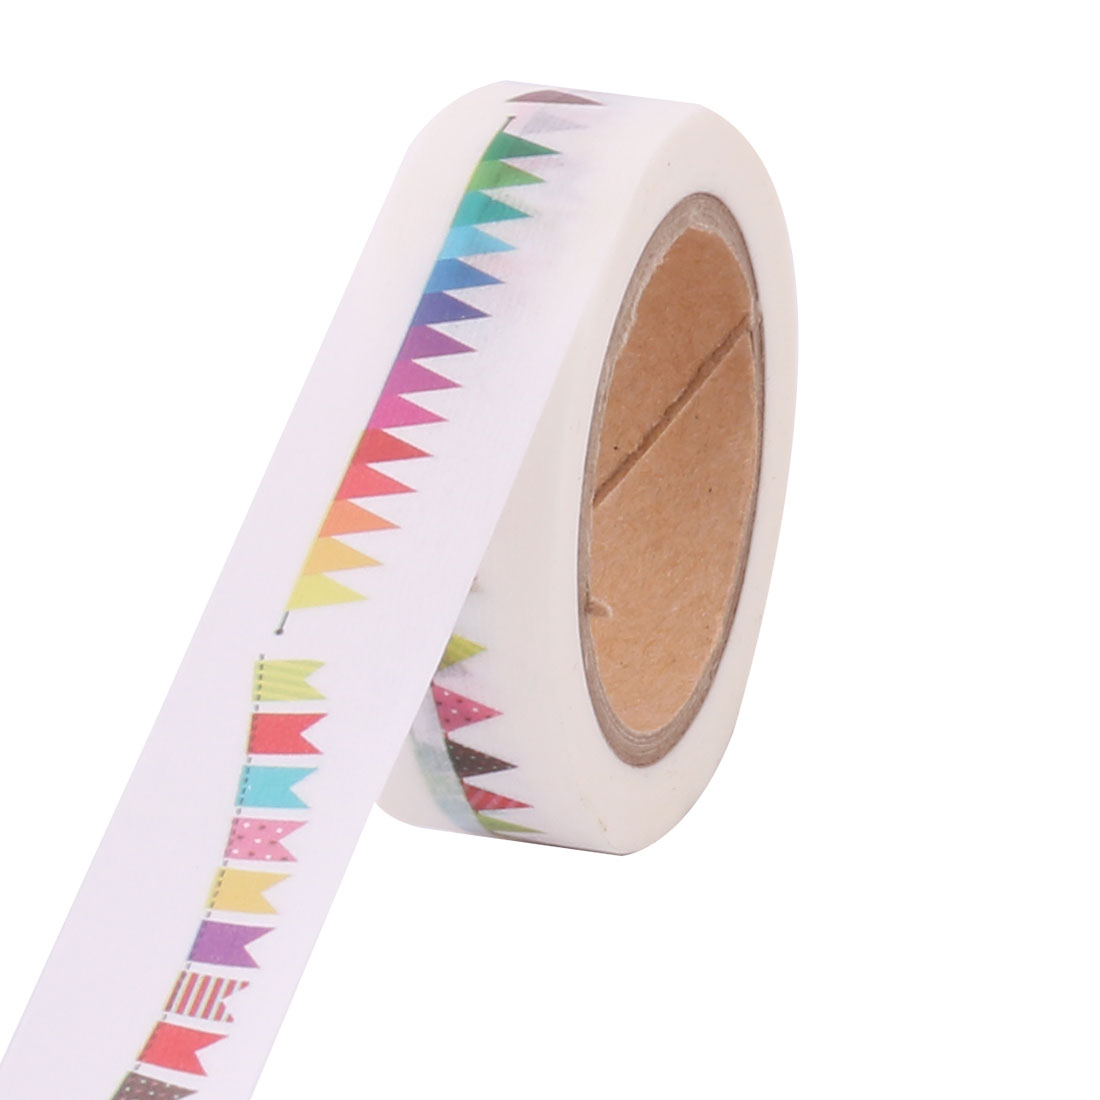 School Washi Paper Banner Print DIY Gift Packing Sticker Adhesive Tape 3pcs - image 2 of 5